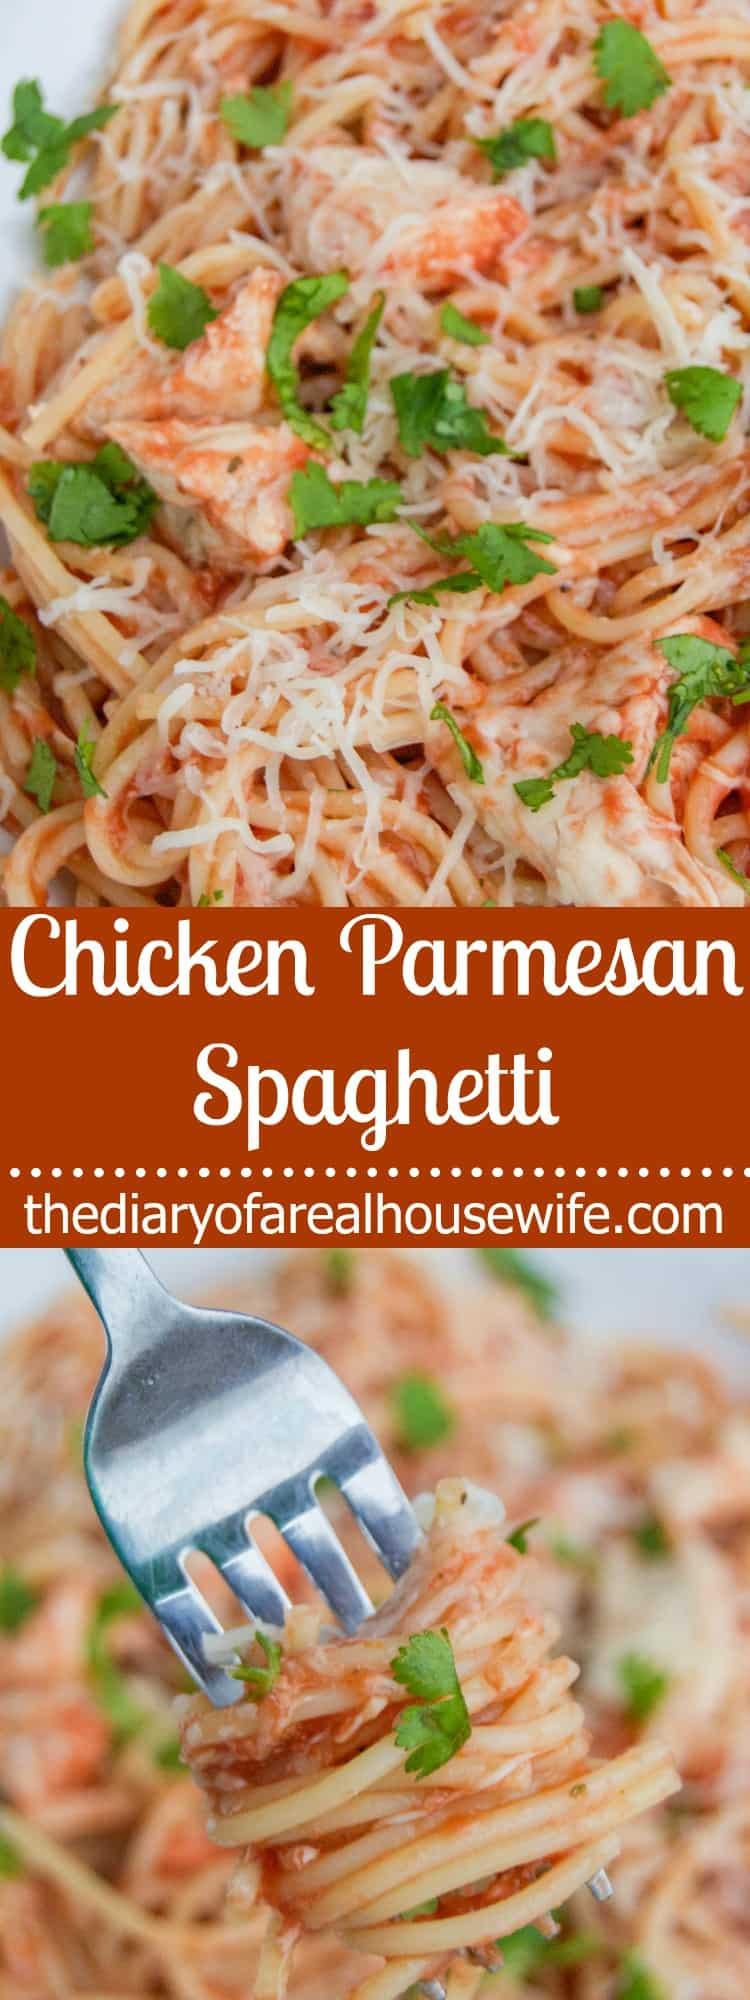 chicken-parmesan-spaghetti